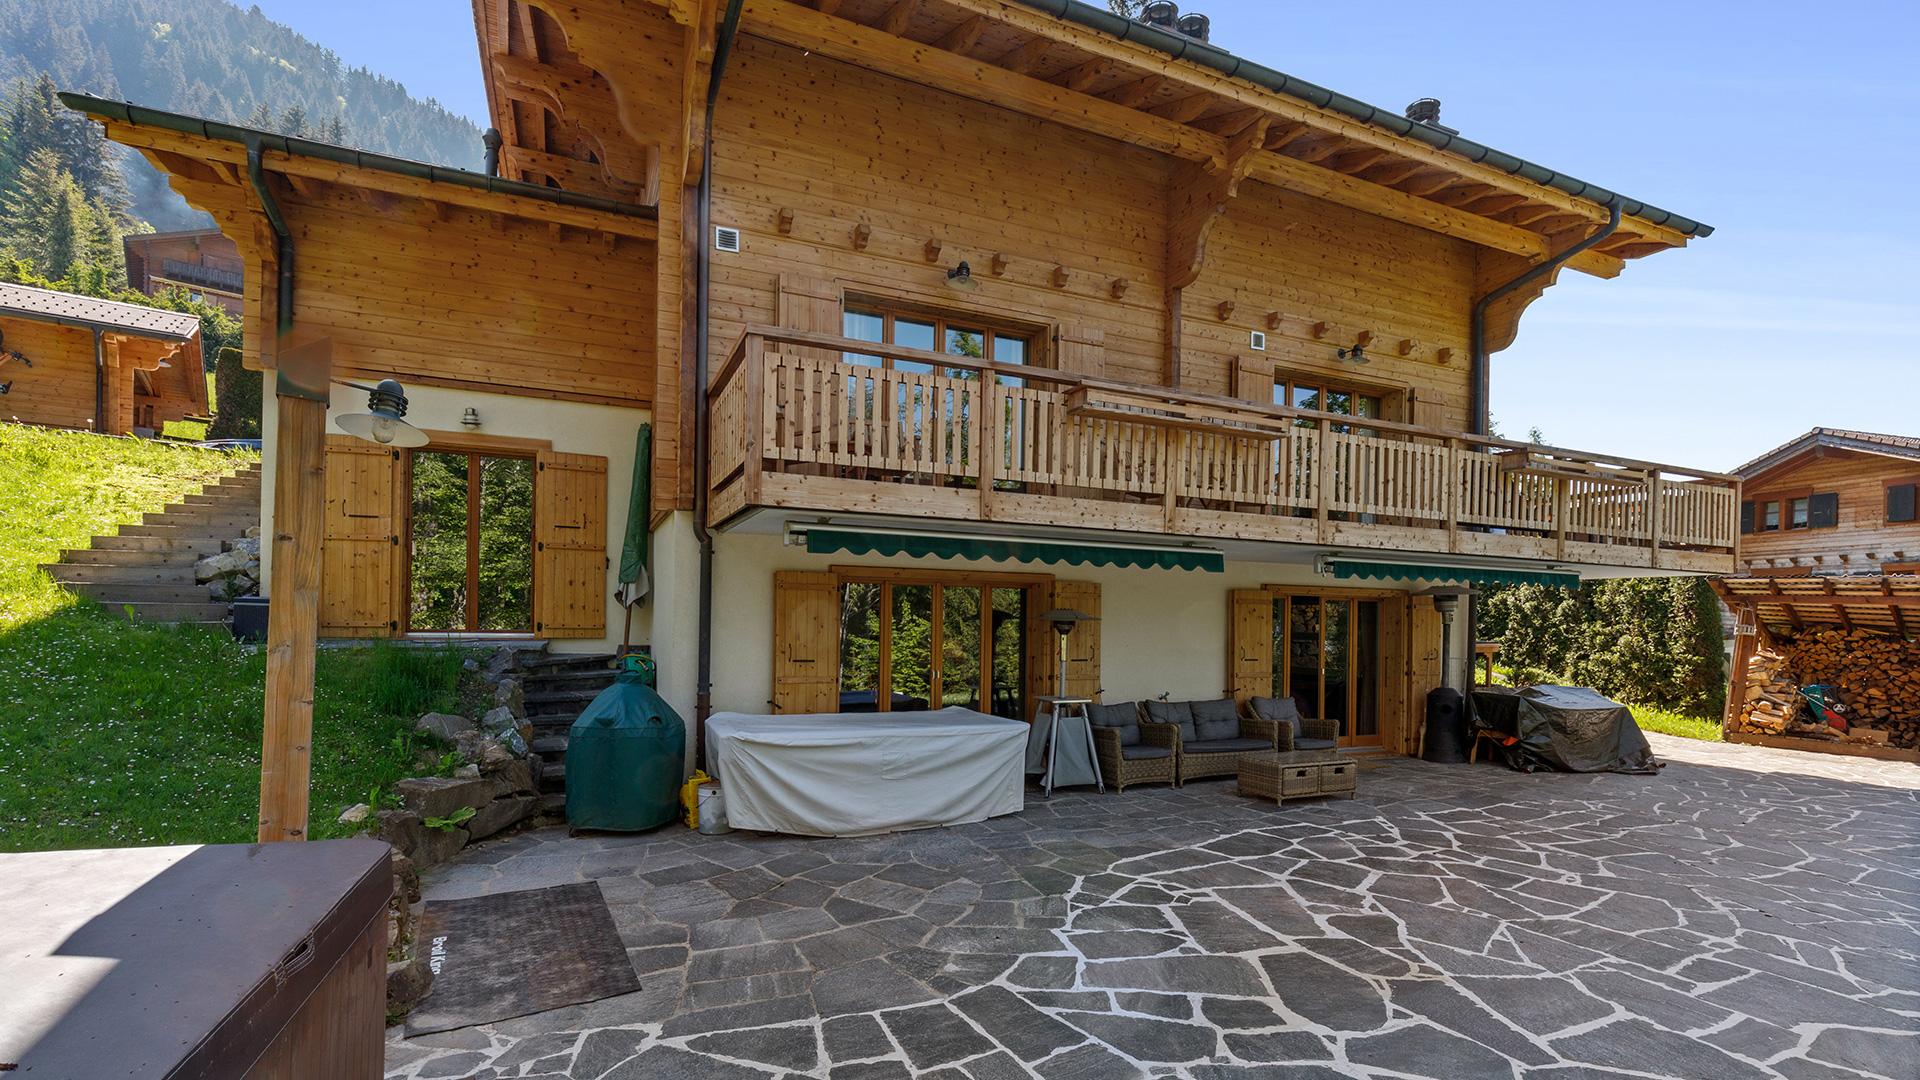 Chalet Meyney Chalet, Switzerland